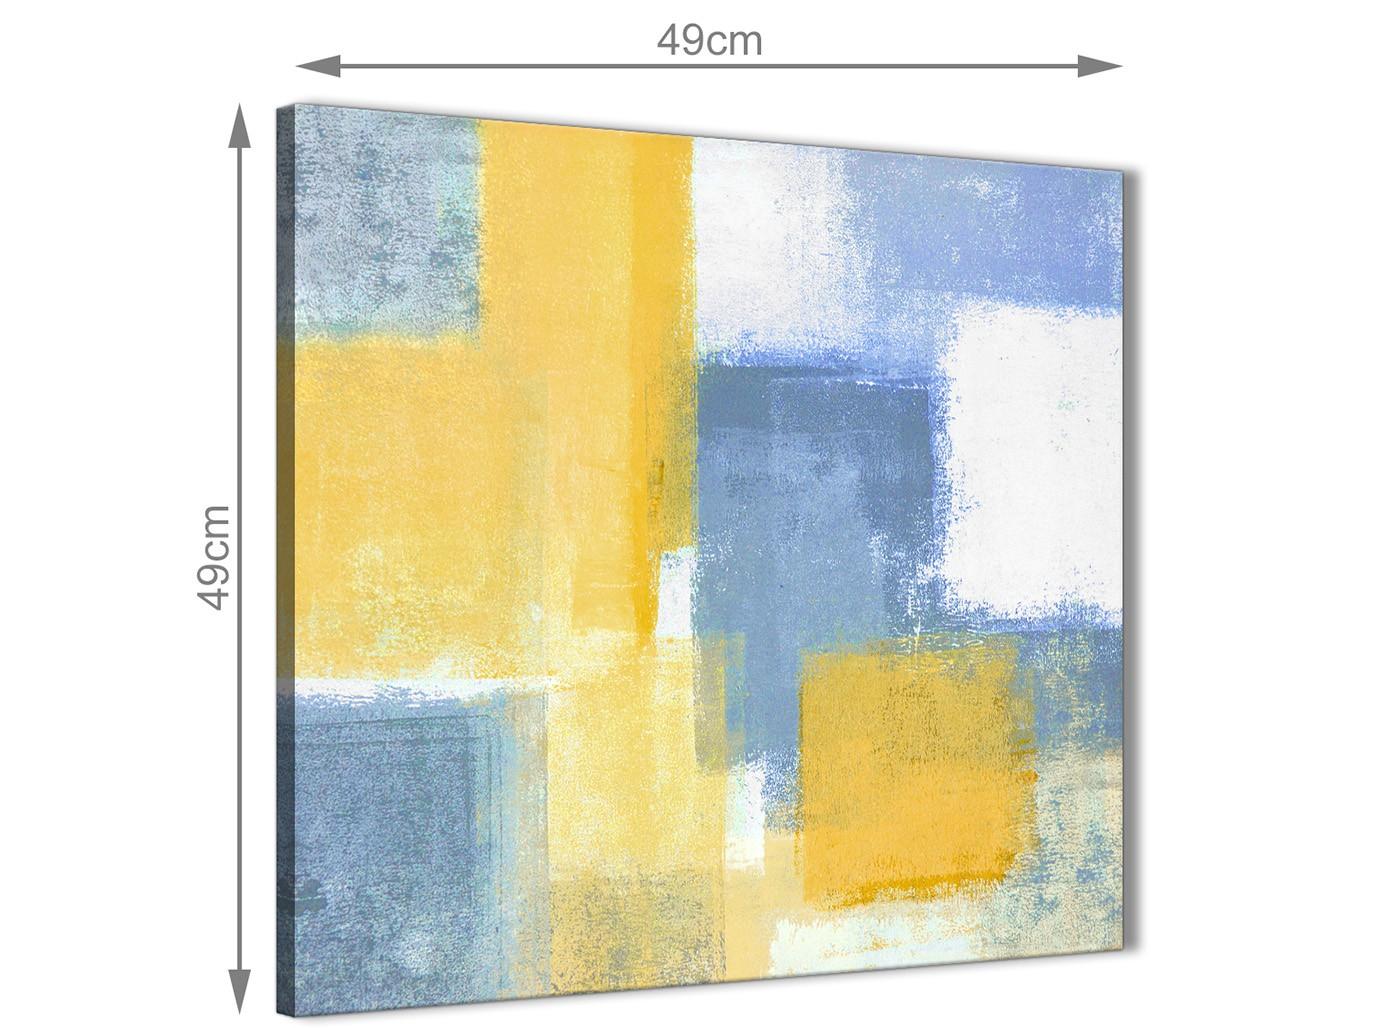 Mustard yellow blue bathroom canvas wall art accessories for Mustard bathroom accessories uk